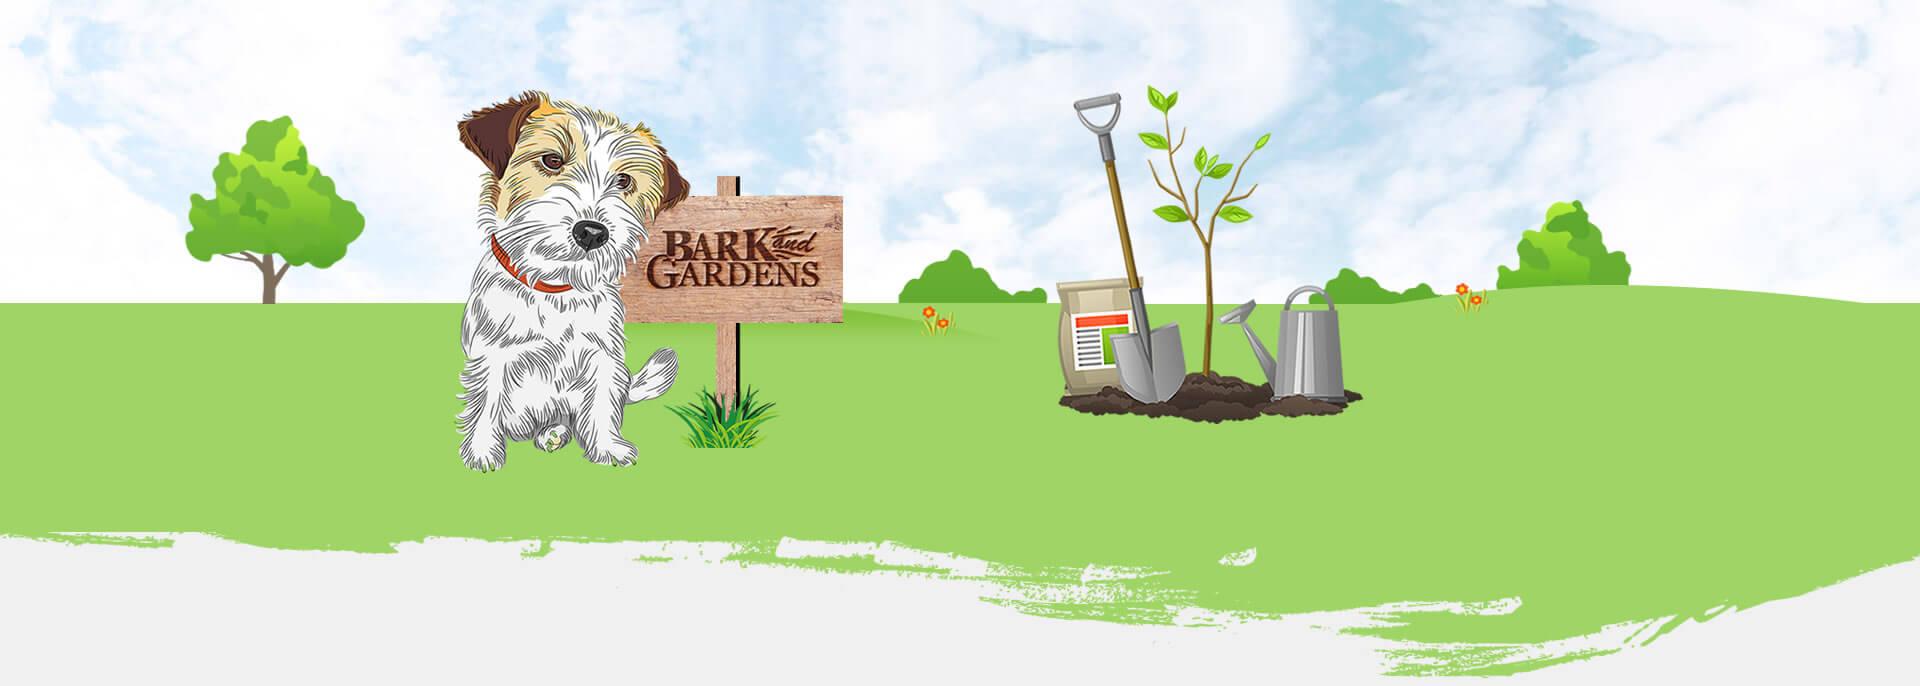 Artwork of a Bristol garden and a Jack Russel for Bristol Based Gardener, Bark and Gardens